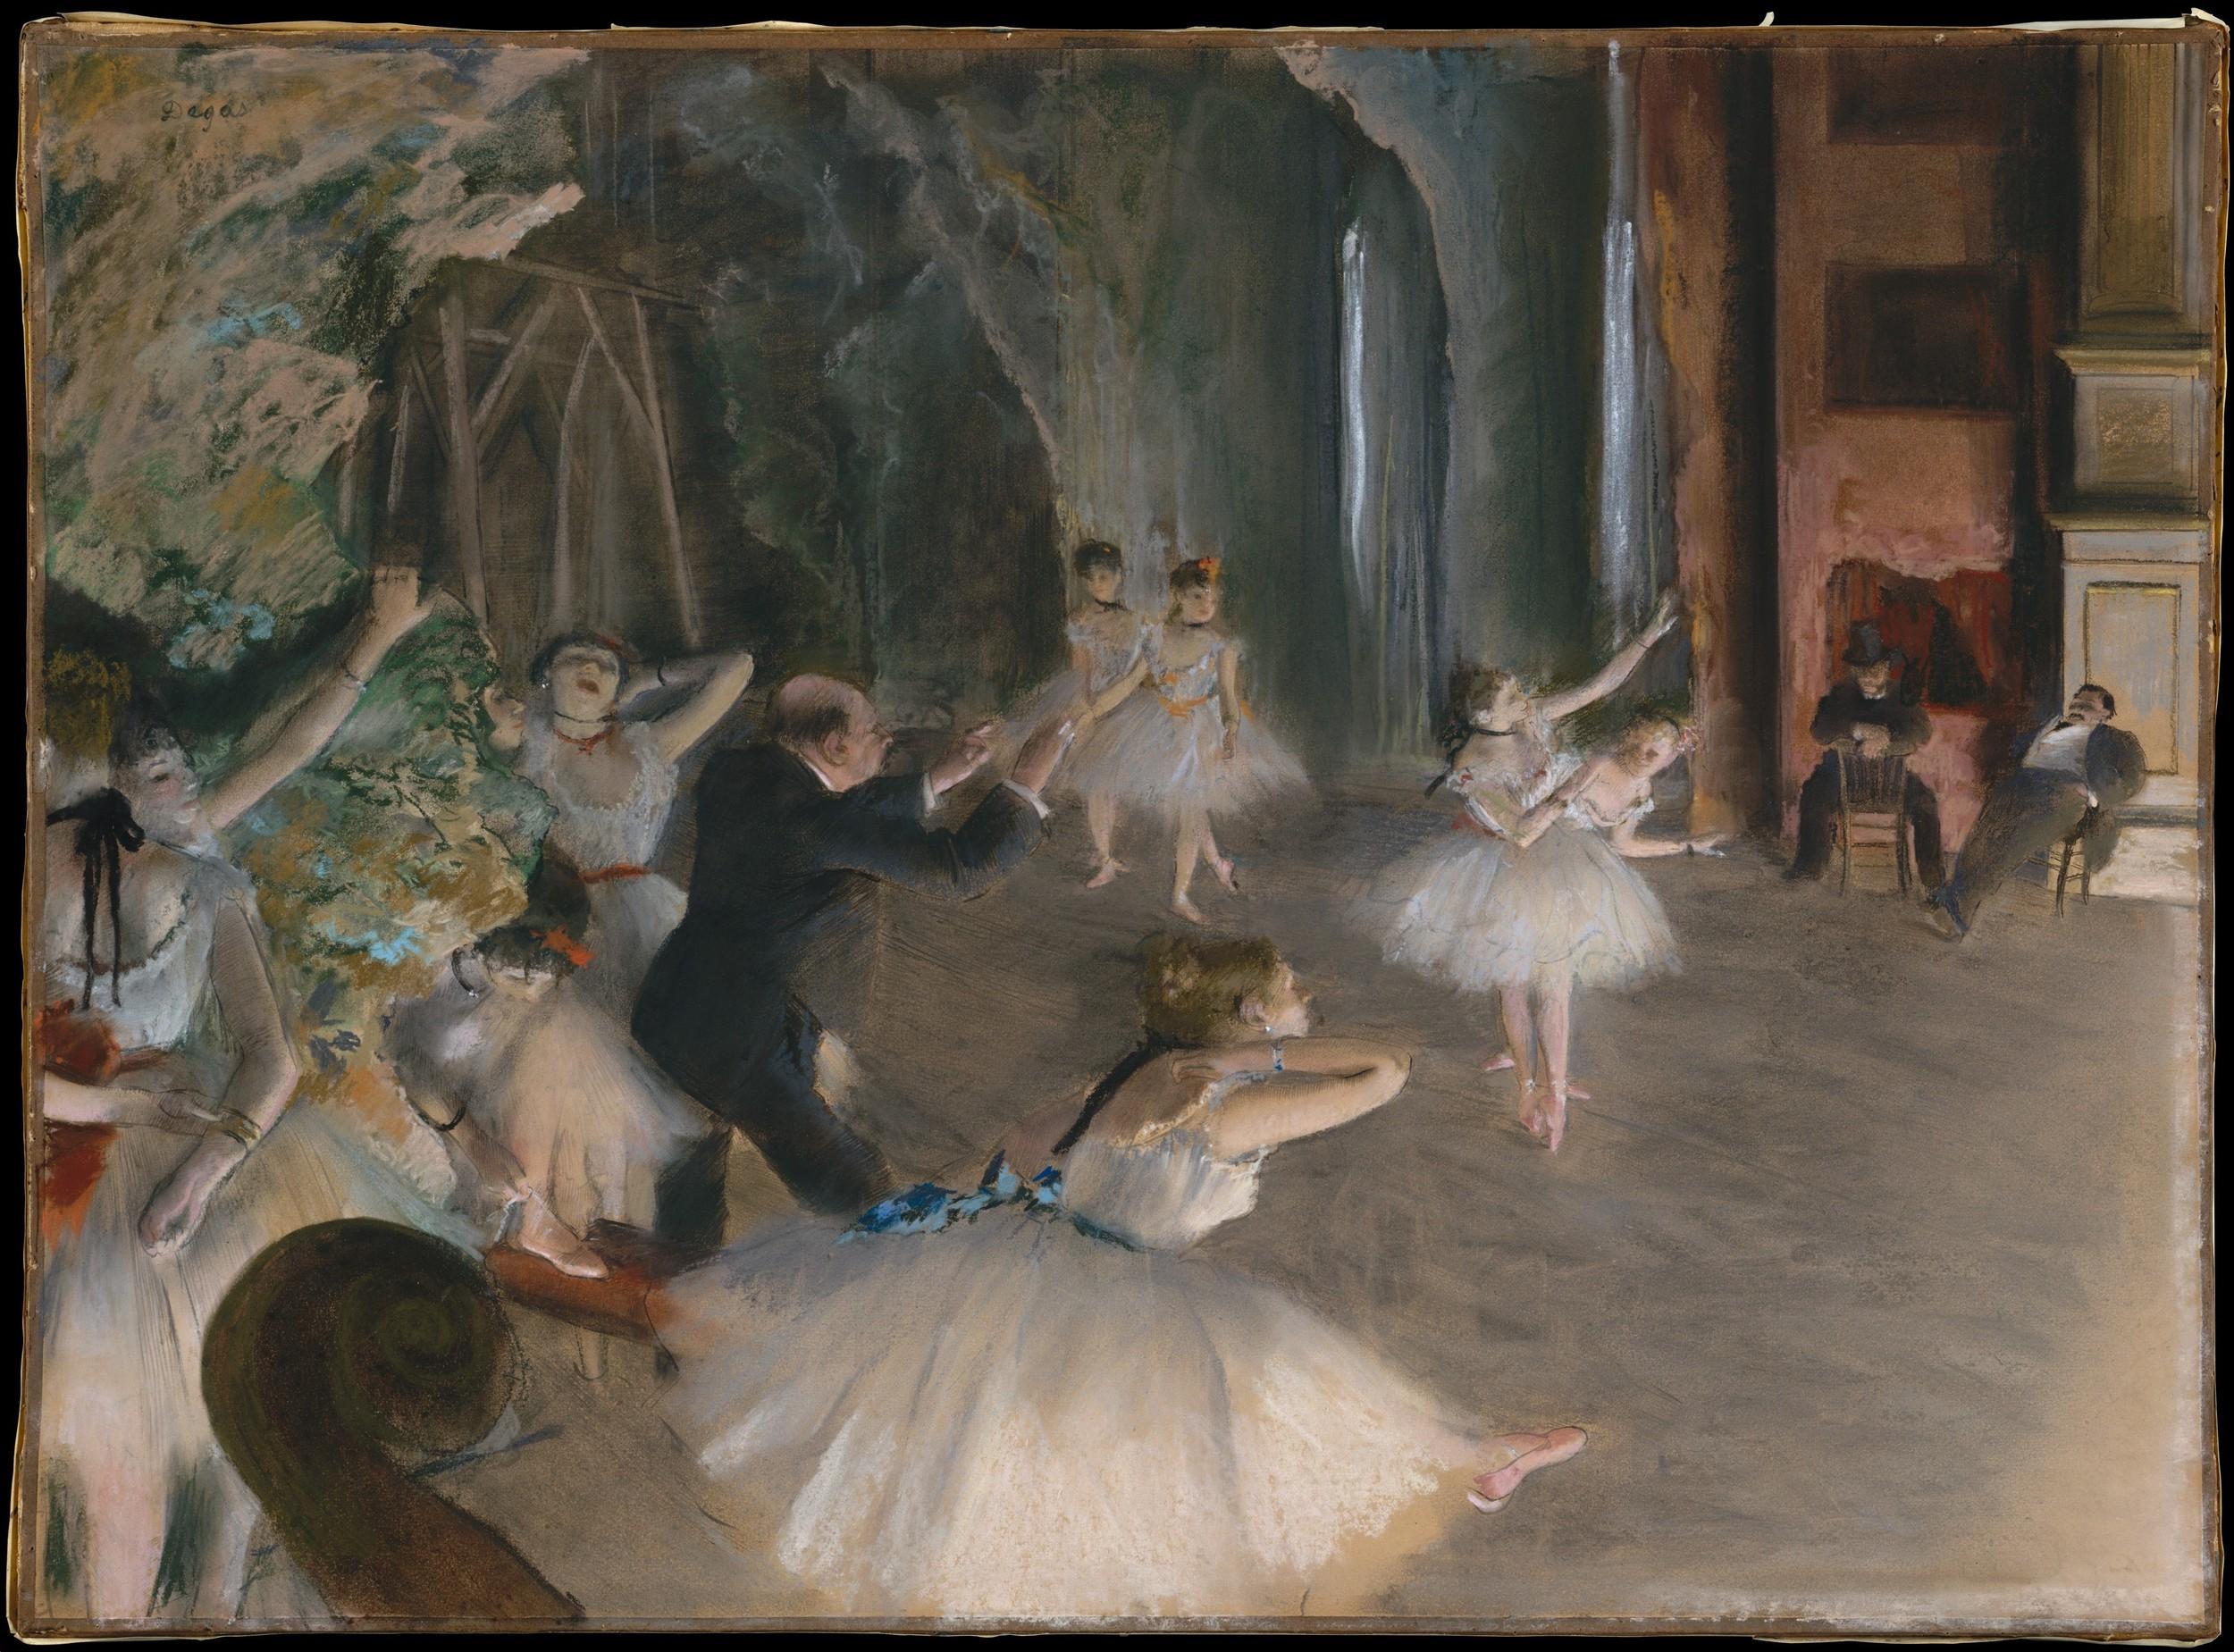 Edgar Degas,  Stage Rehearsal , 1878–1879, The Metropolitan Museum of Art, New York.